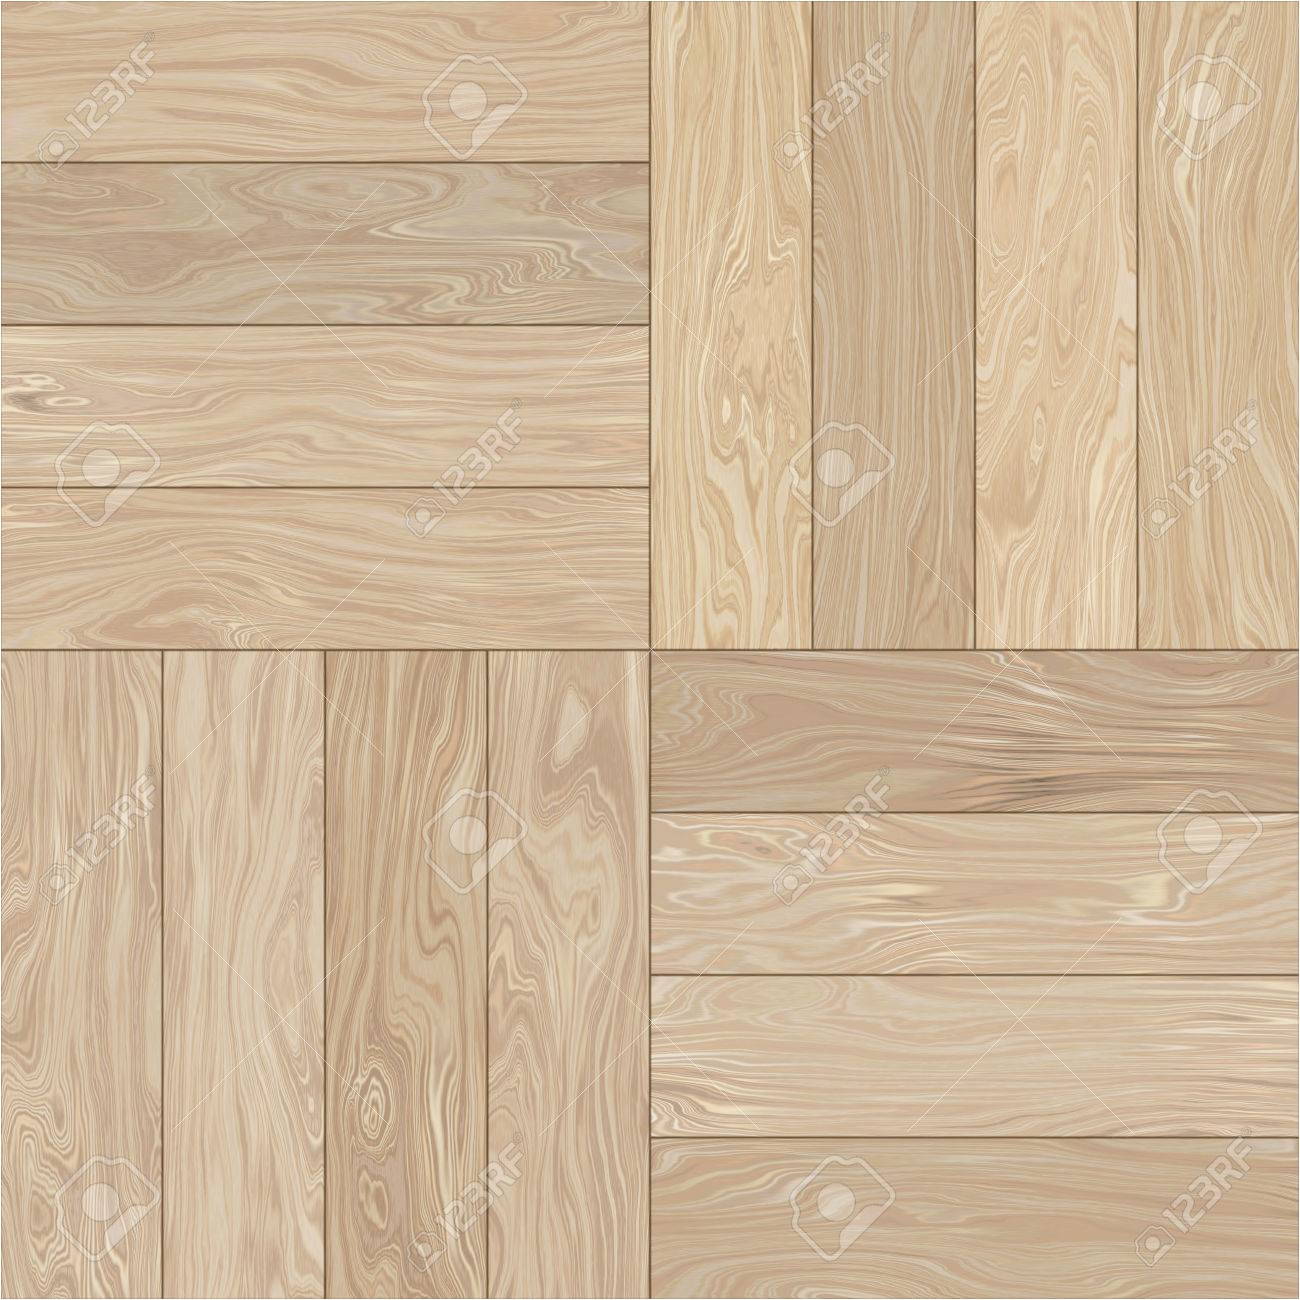 engineered hardwood flooring vs solid hardwood of wooden floor texture bradshomefurnishings with regard to wooden floor texture wood floor background seamless background wooden texture parquet